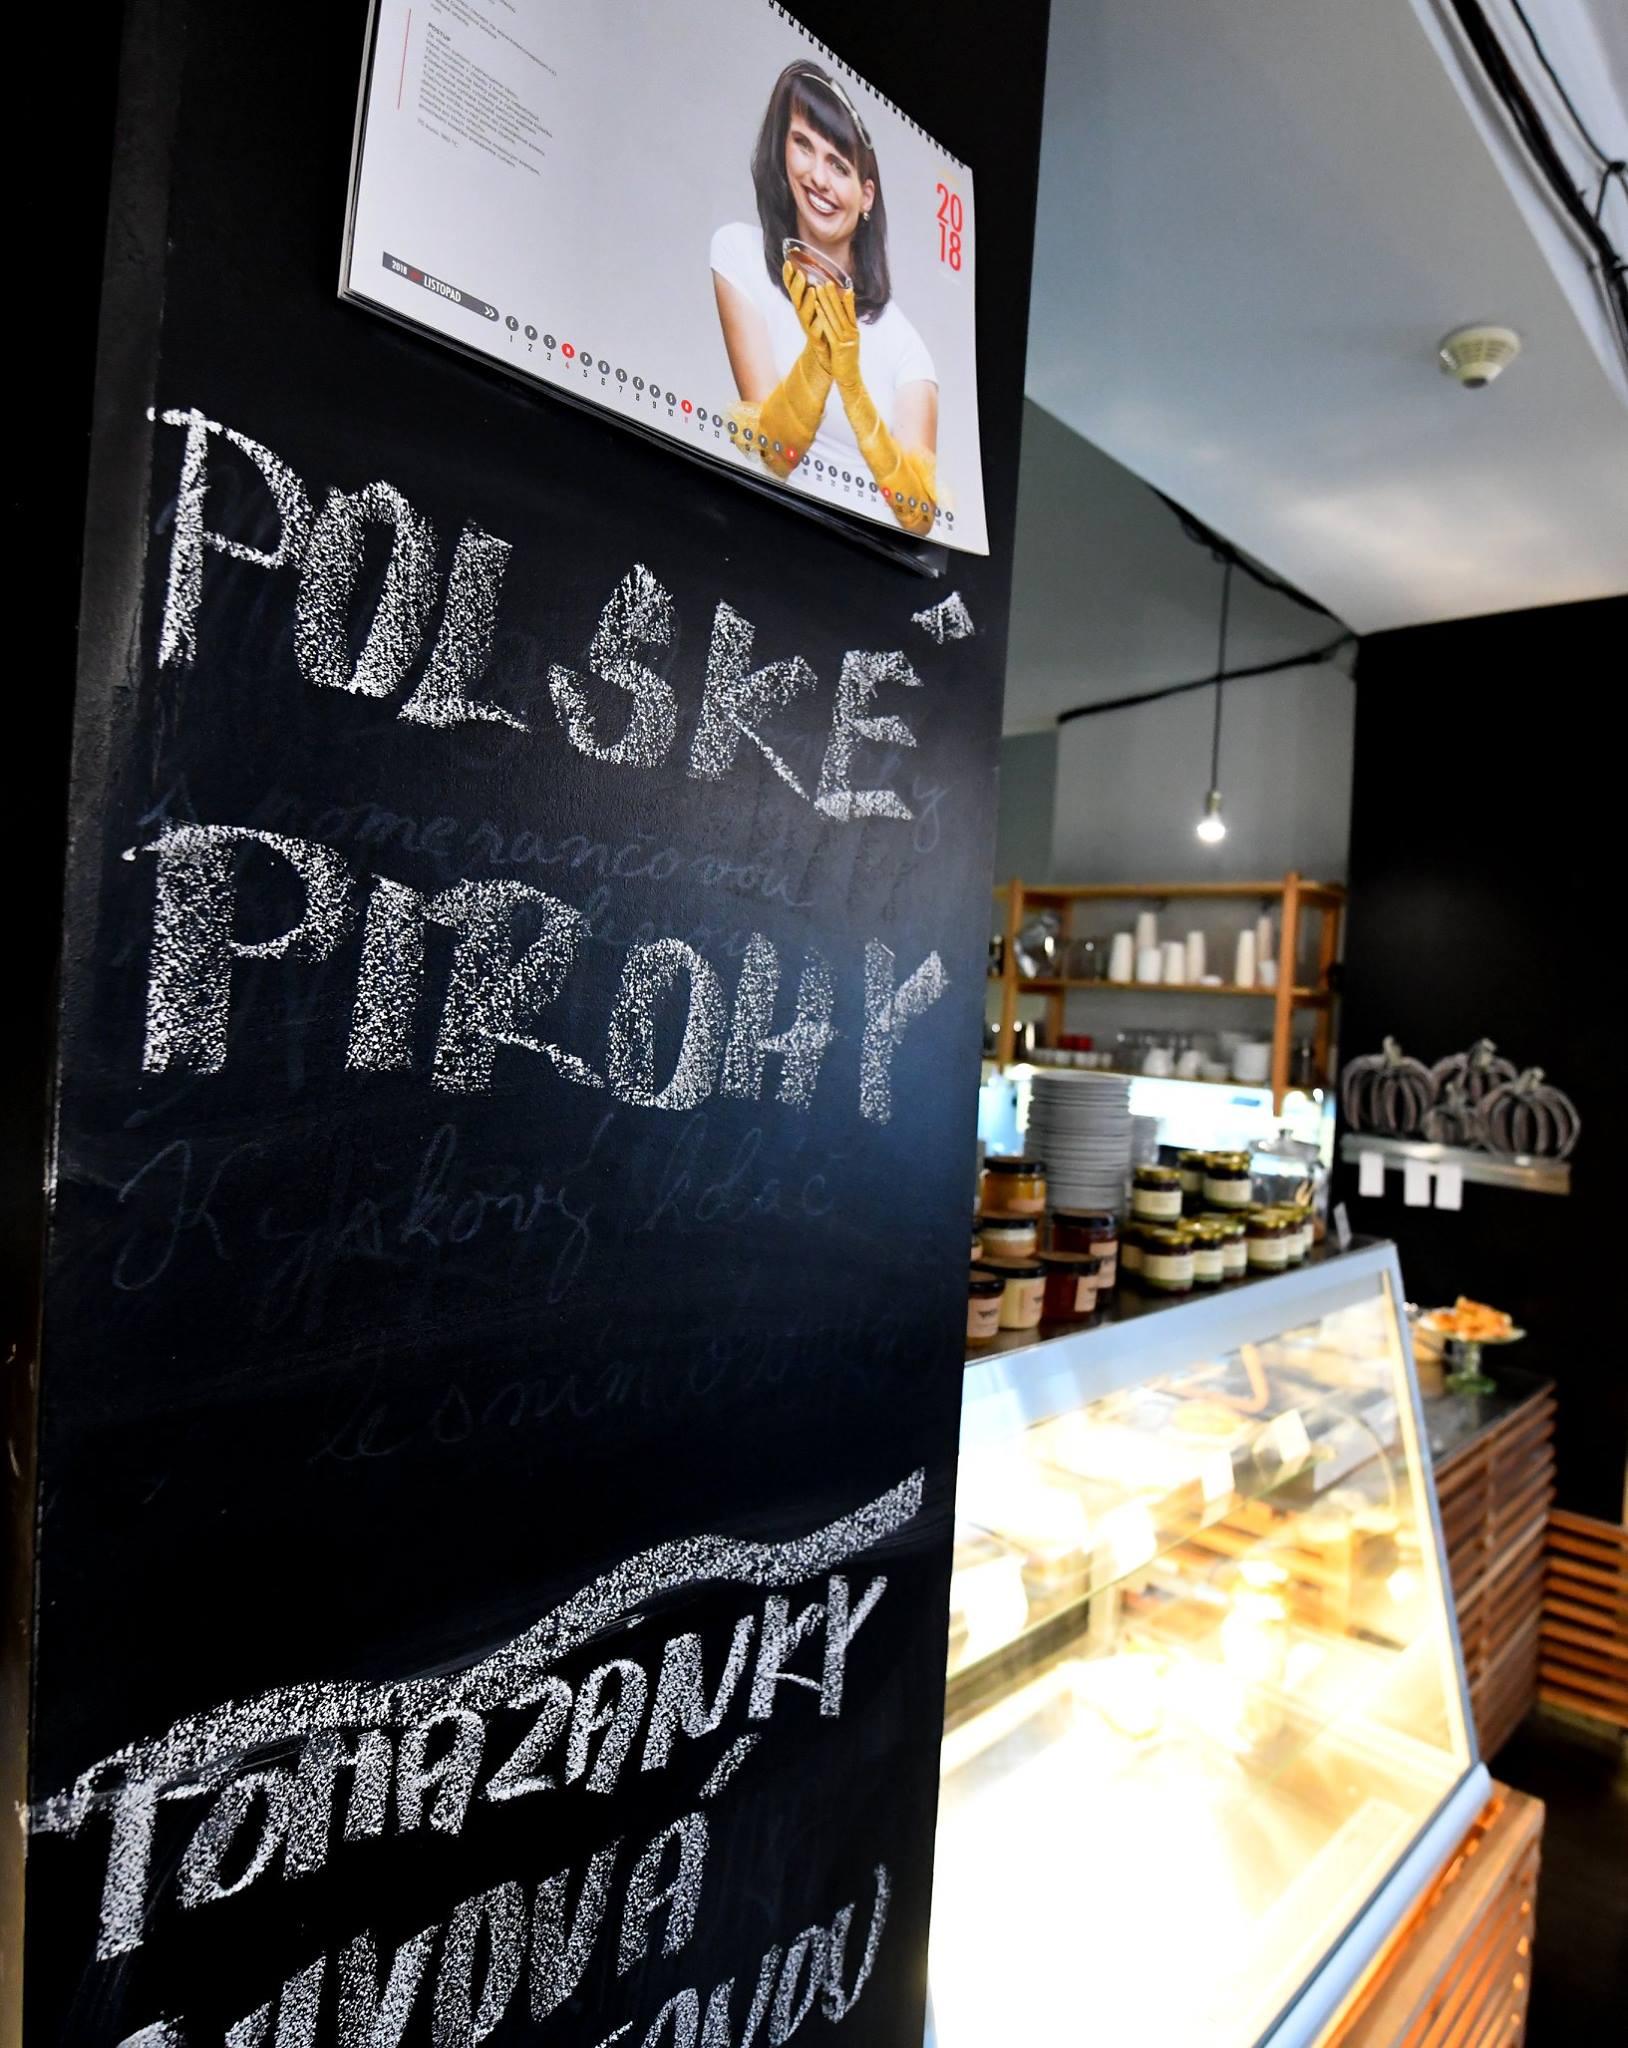 Polské gastro.jpg